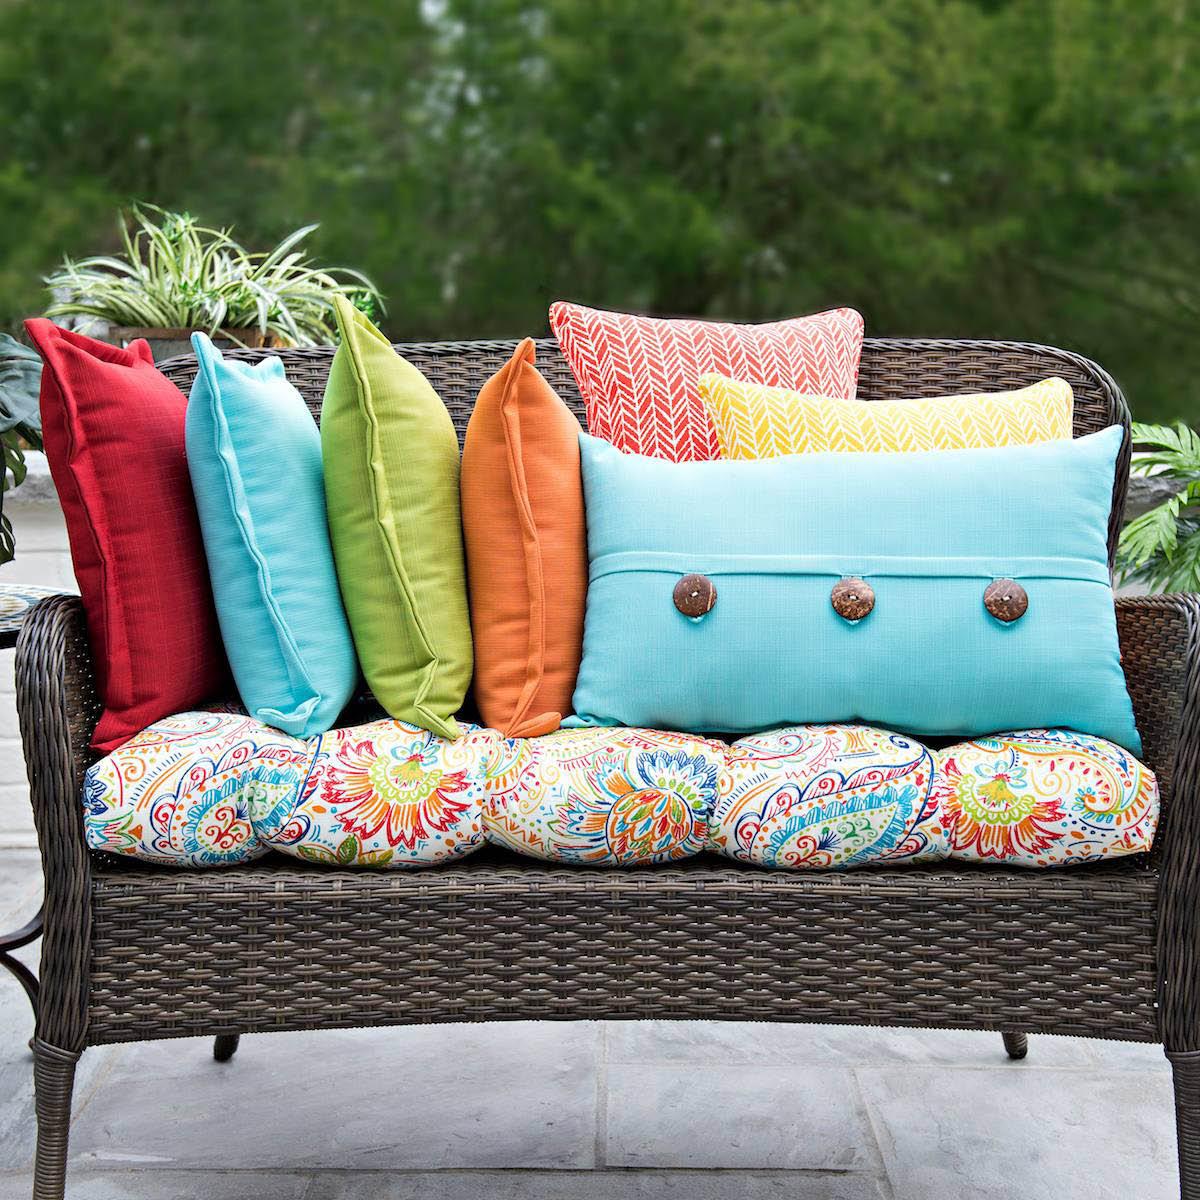 Patio furniture, outdoor living